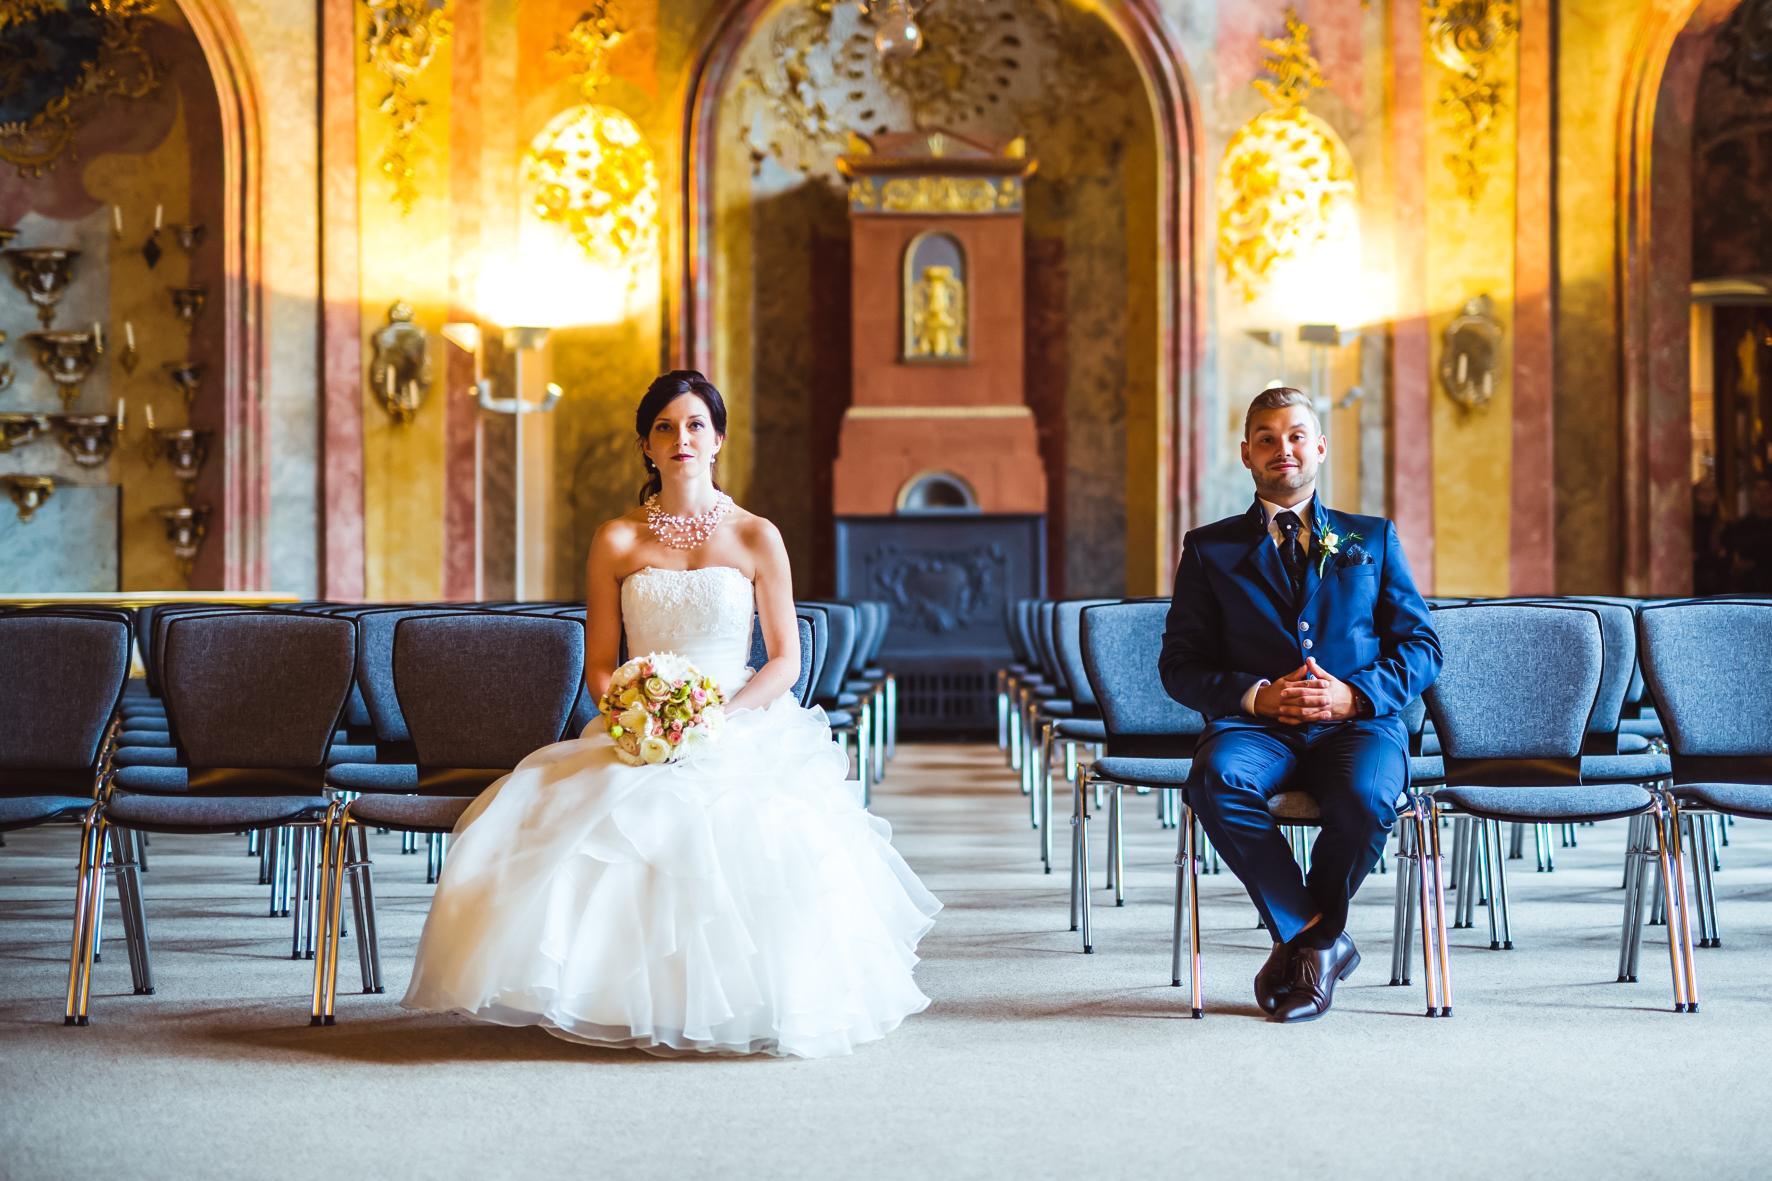 Hochzeitsfotos-Saalfeld (40)